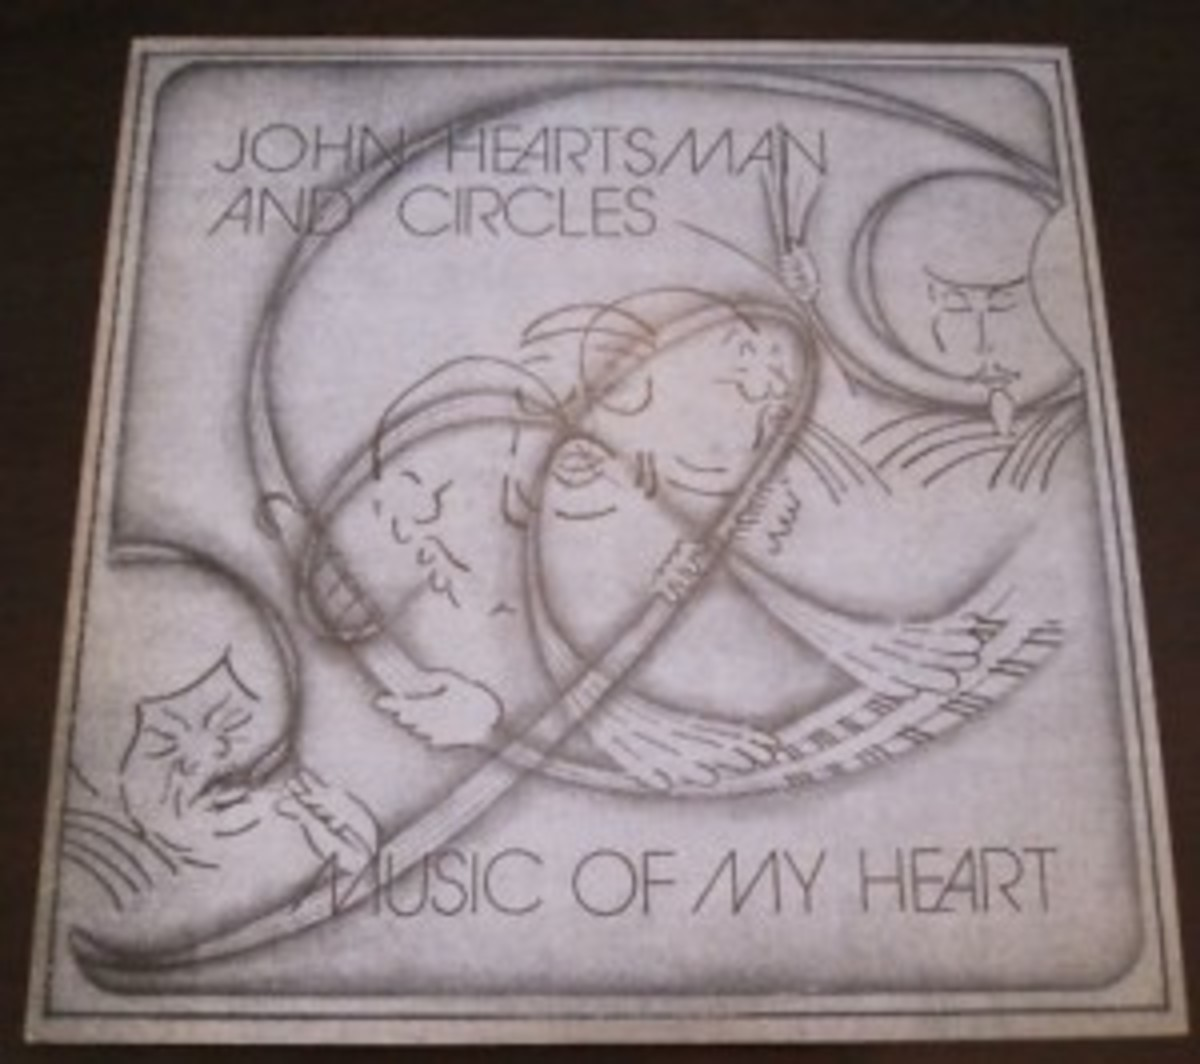 John Heartsman And Circles Music of My Heart